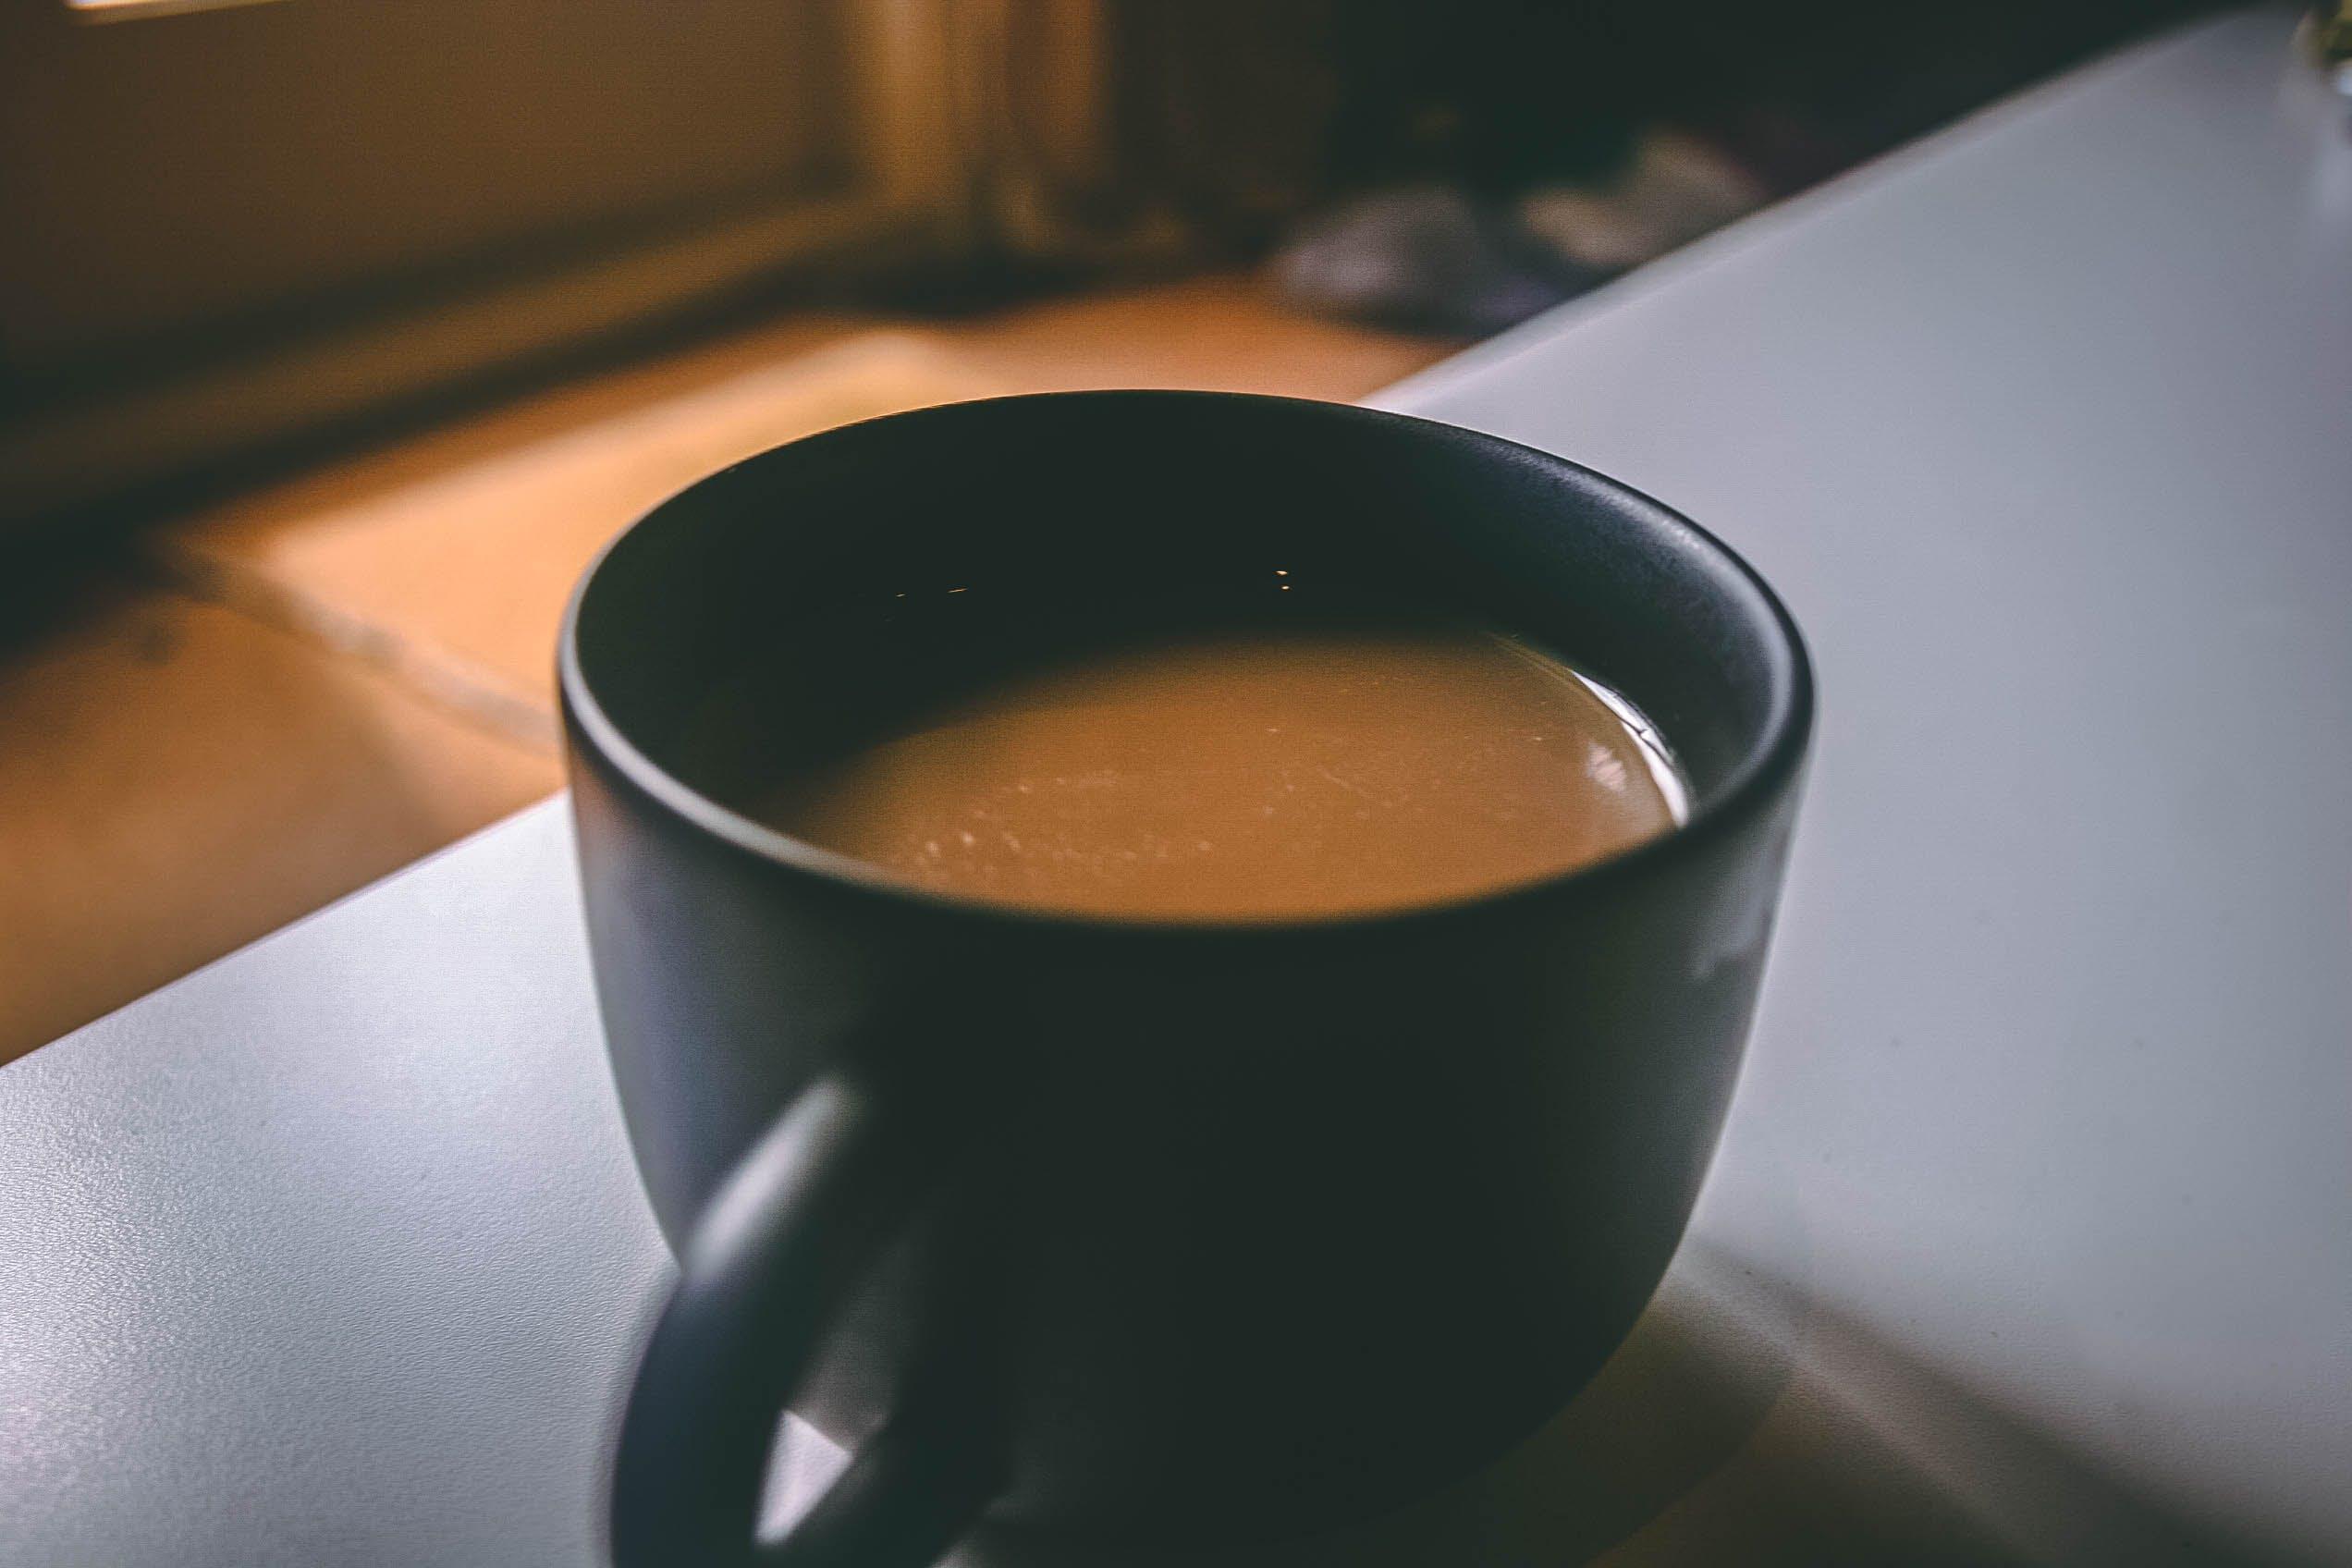 Kostenloses Stock Foto zu becher, cappuccino, drinnen, espresso